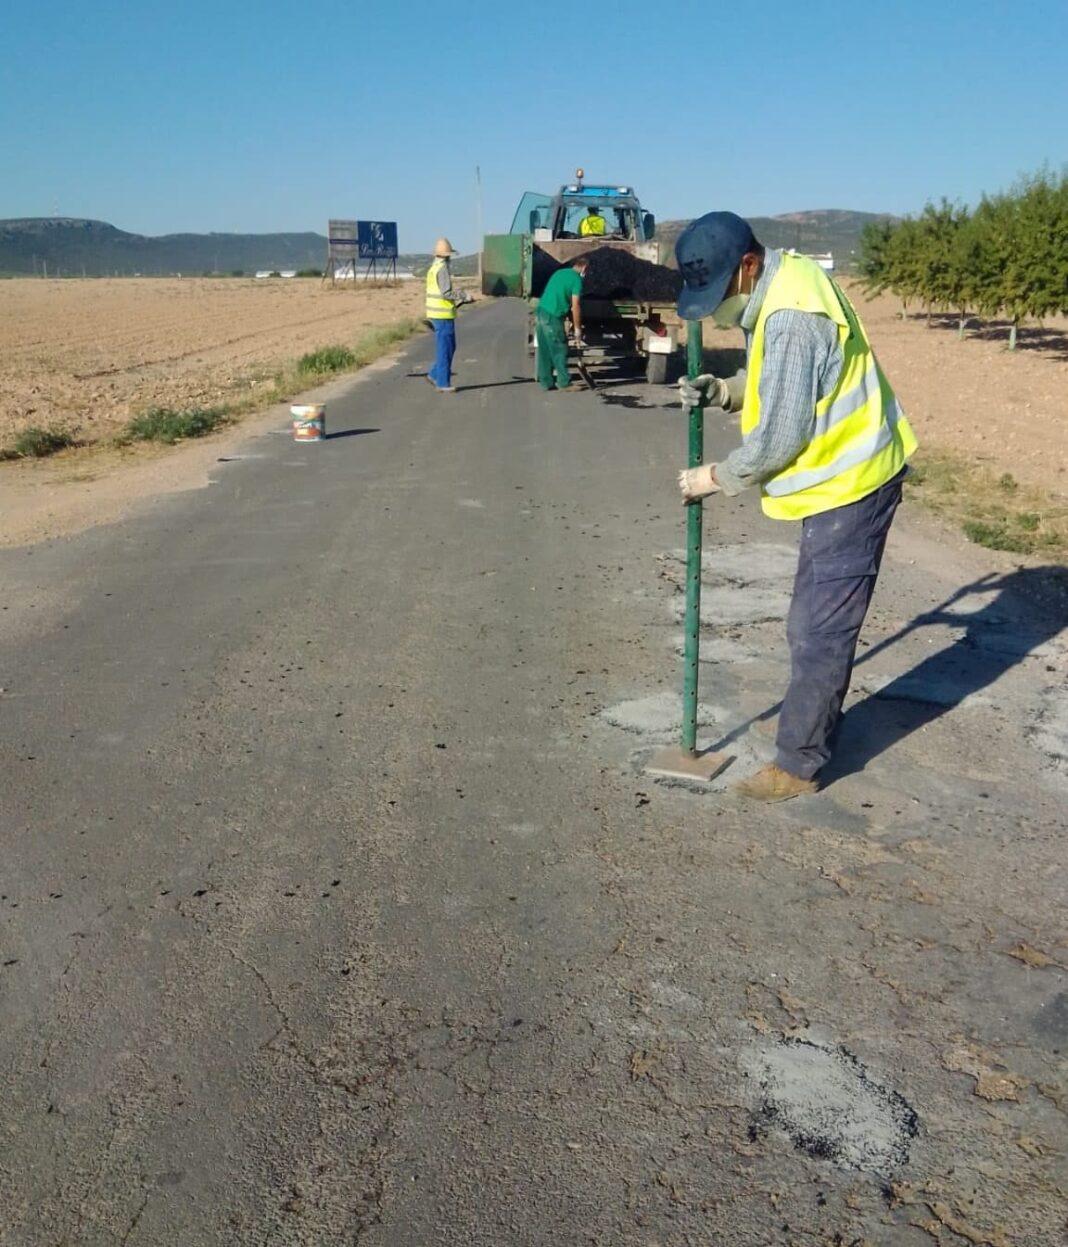 arreglando camino la pedriza pozos del agua herencia 1068x1247 - El camino de La Pedriza en Herencia recibe labores de bacheo